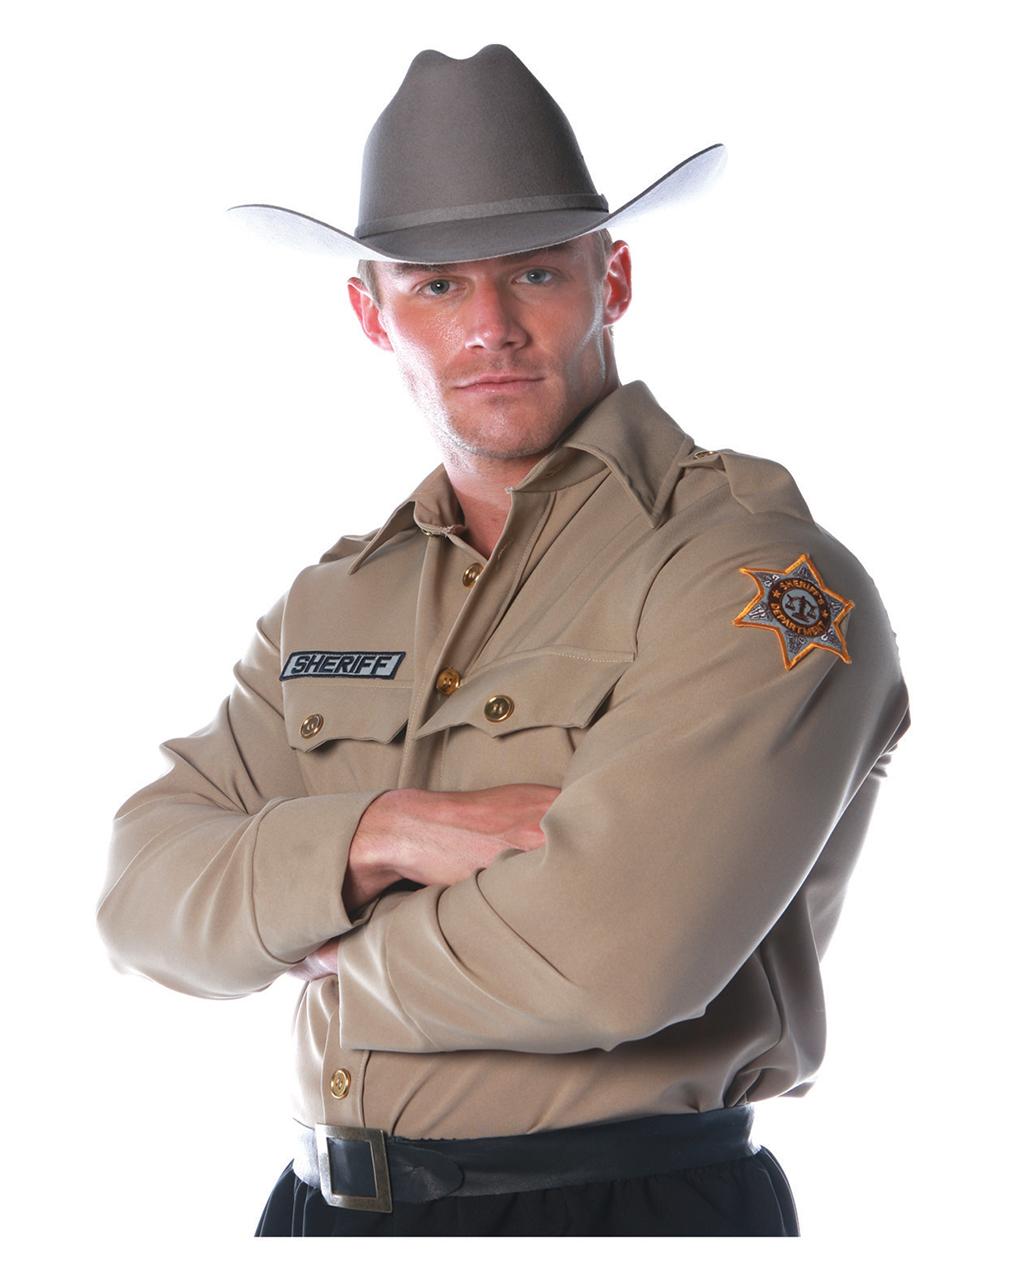 3e5149ebf9326 Sheriff Shirt Costume Size L